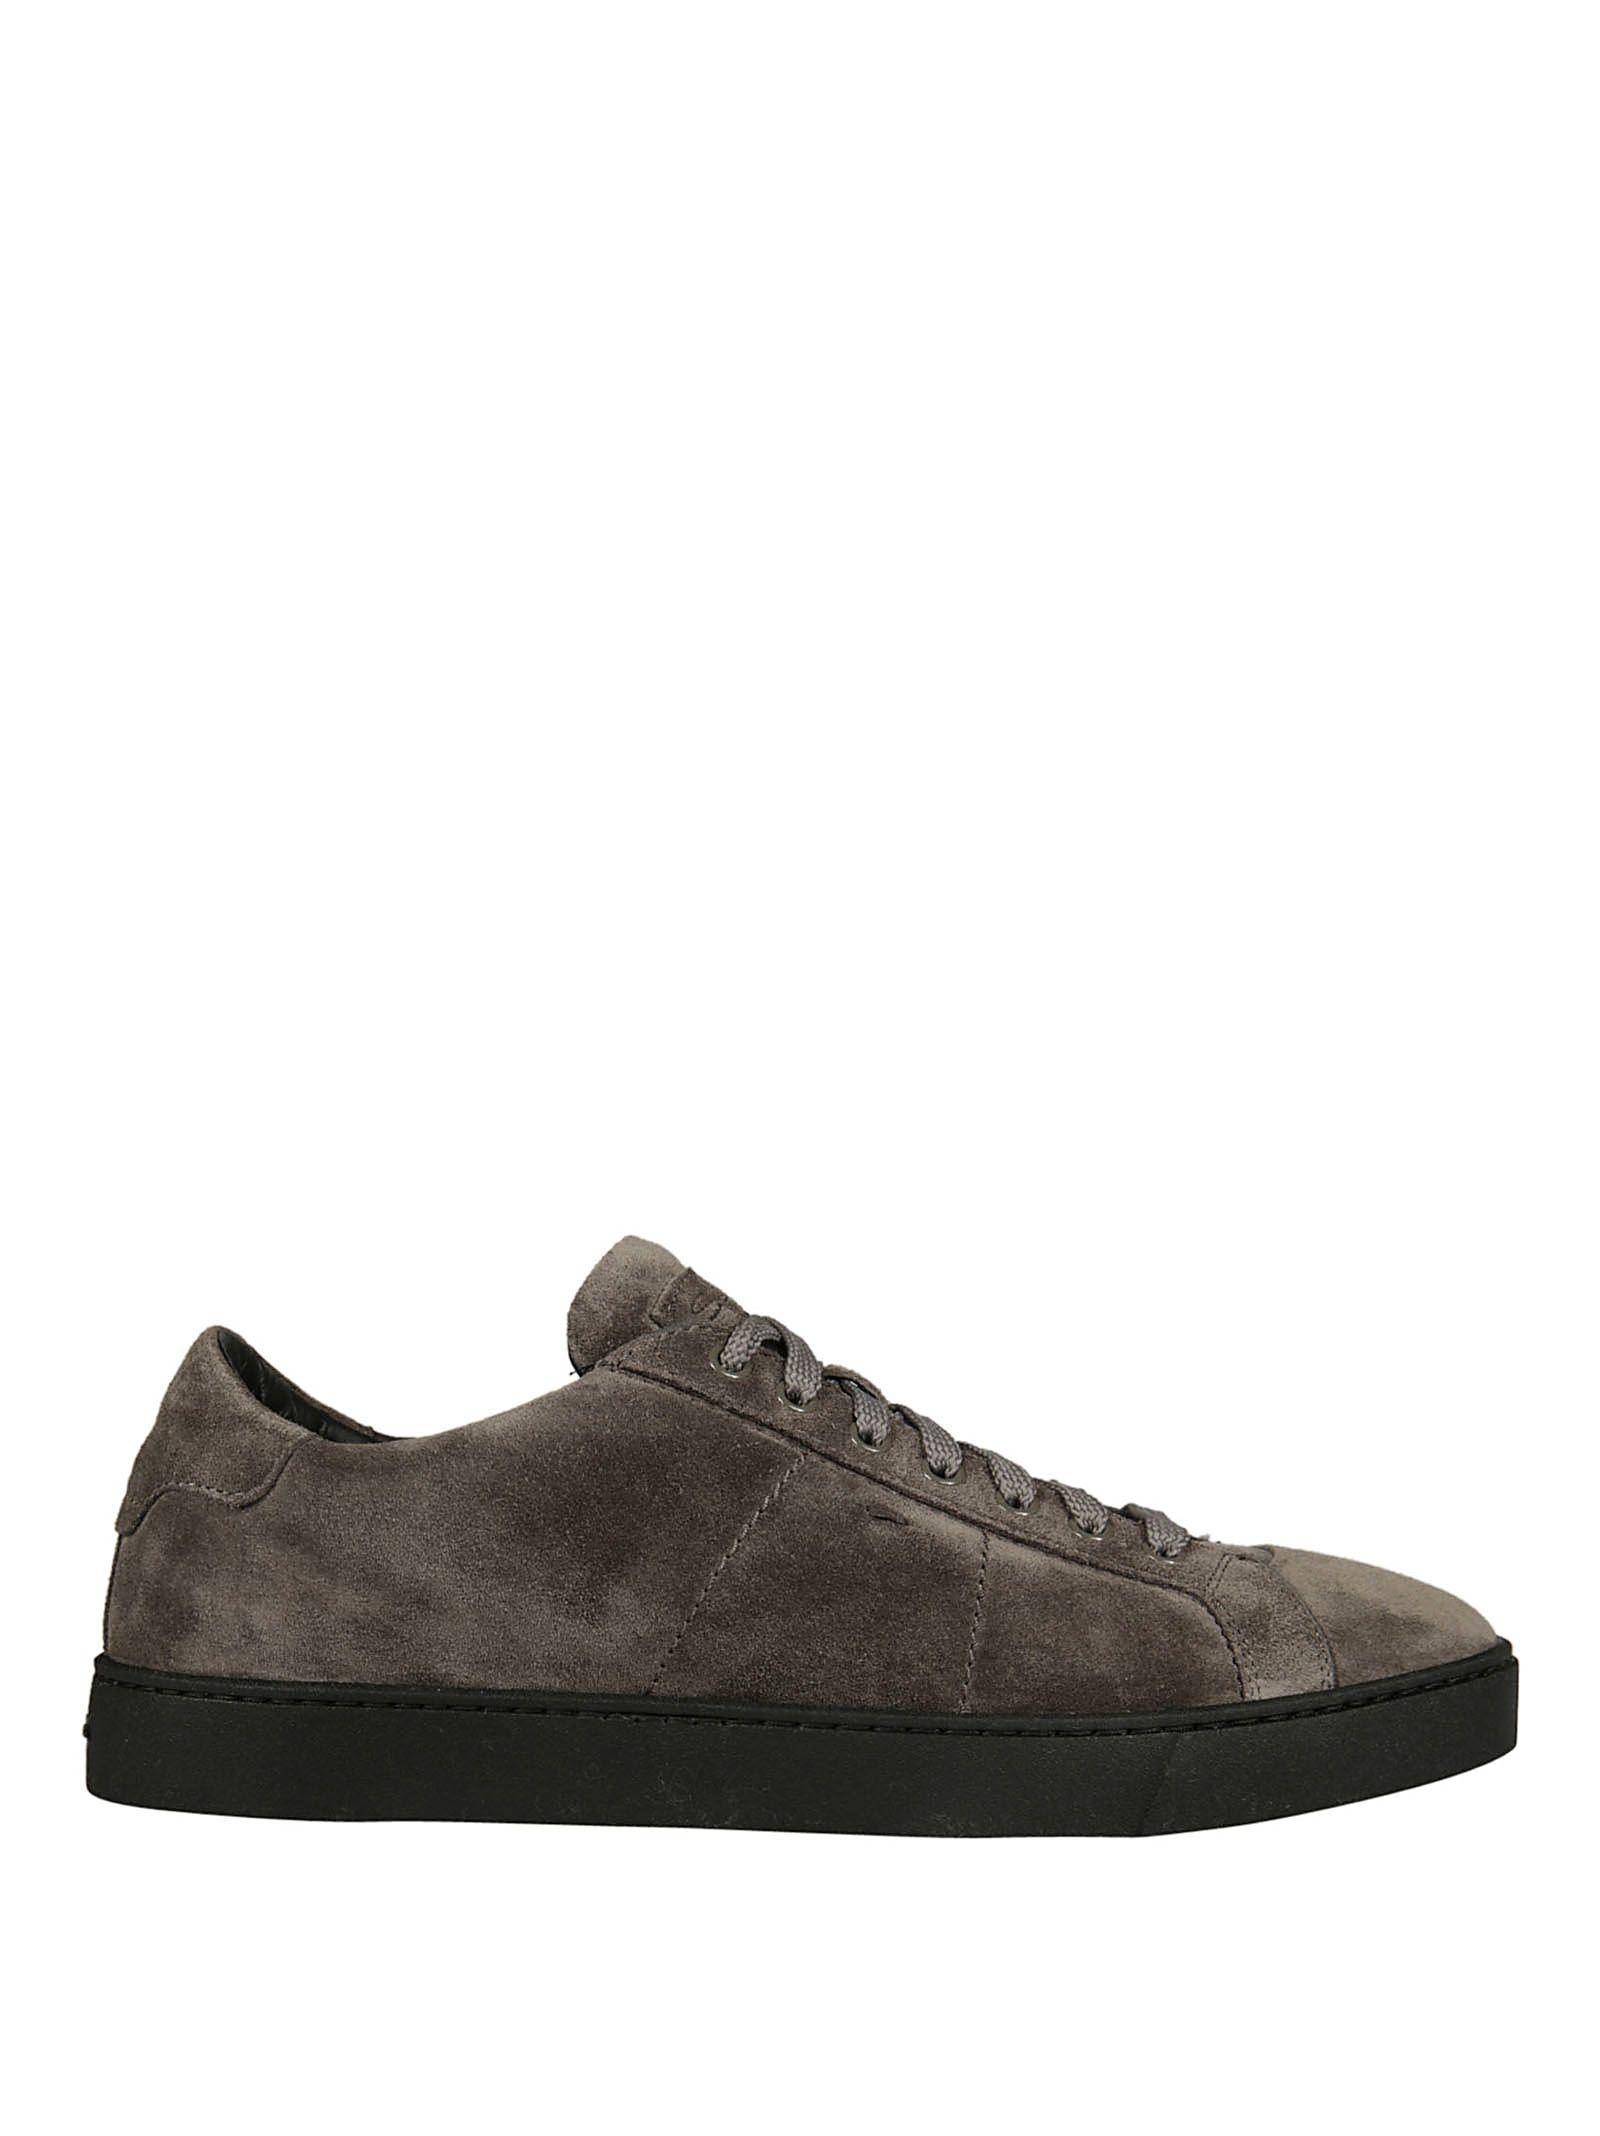 Santoni Sneakers In Grey